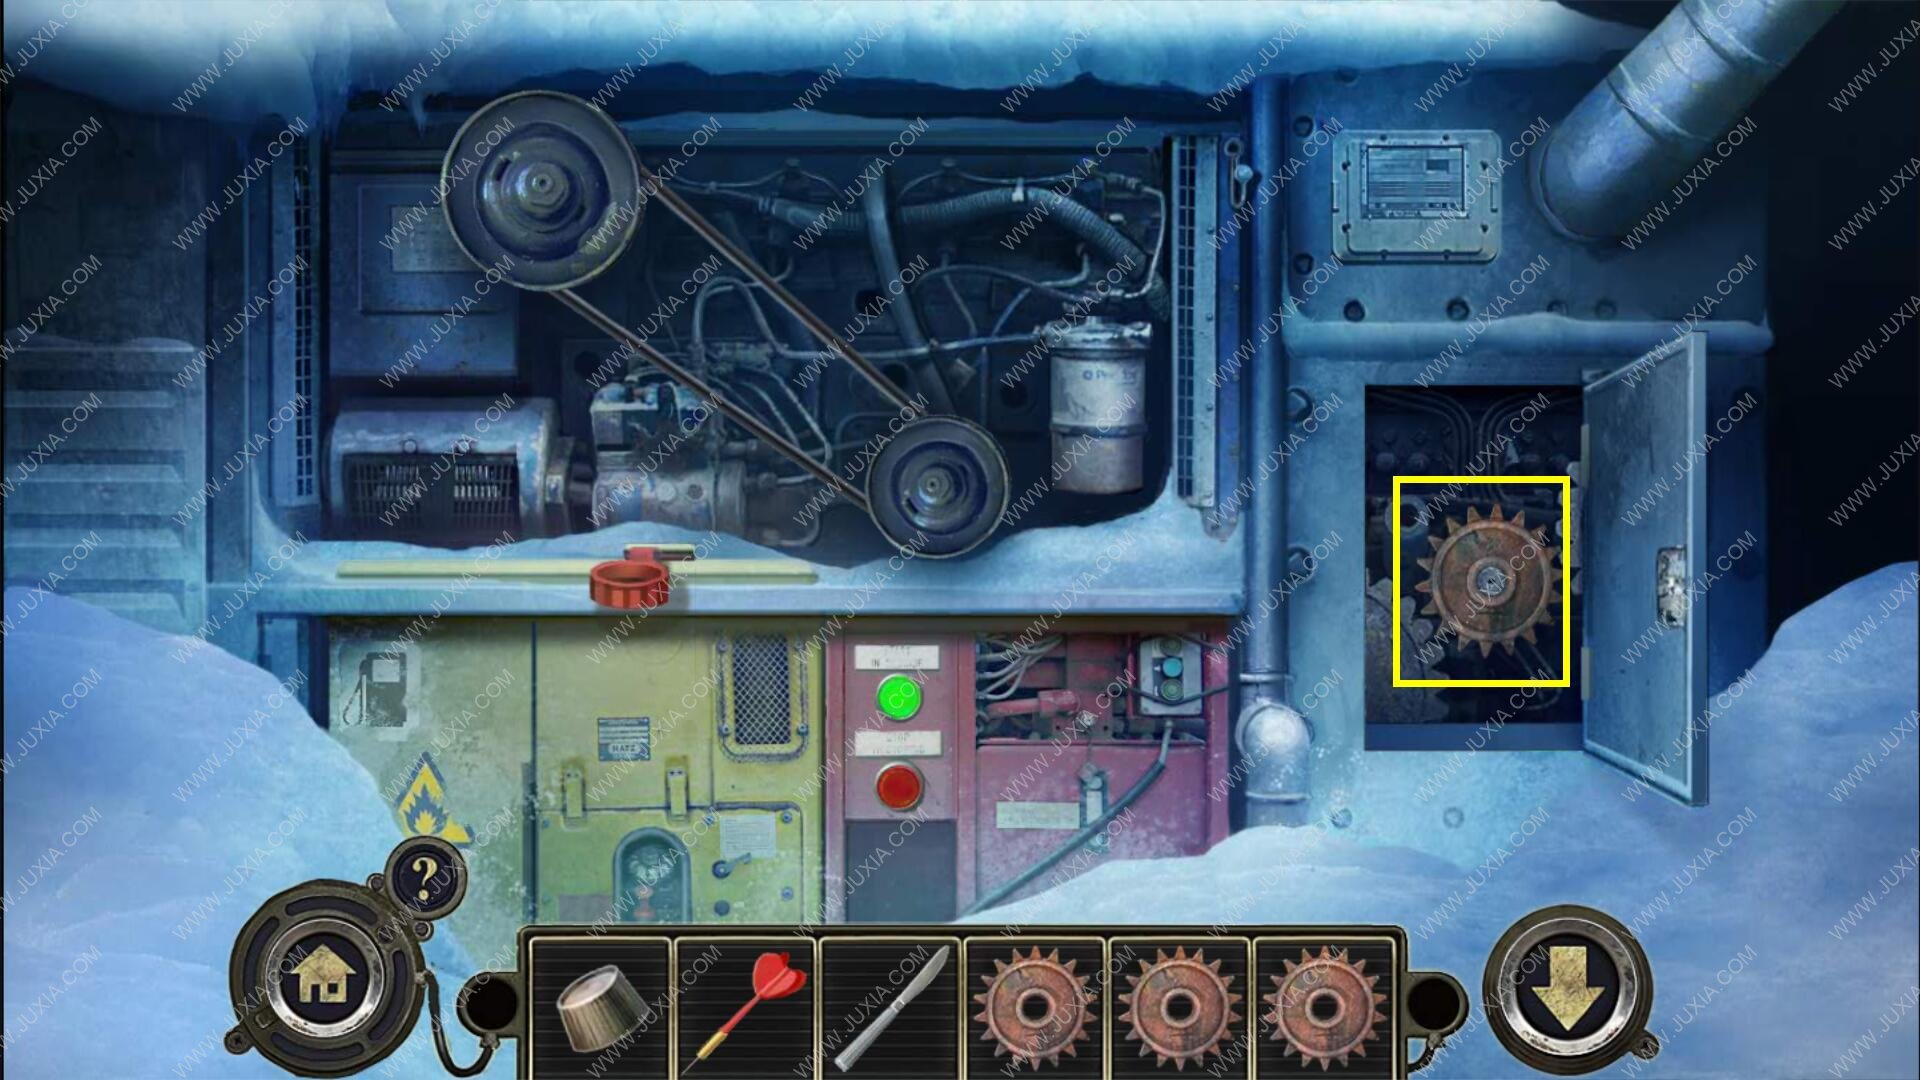 Facility47攻略第三关图文 47号房间攻略第3关储物柜怎么打开